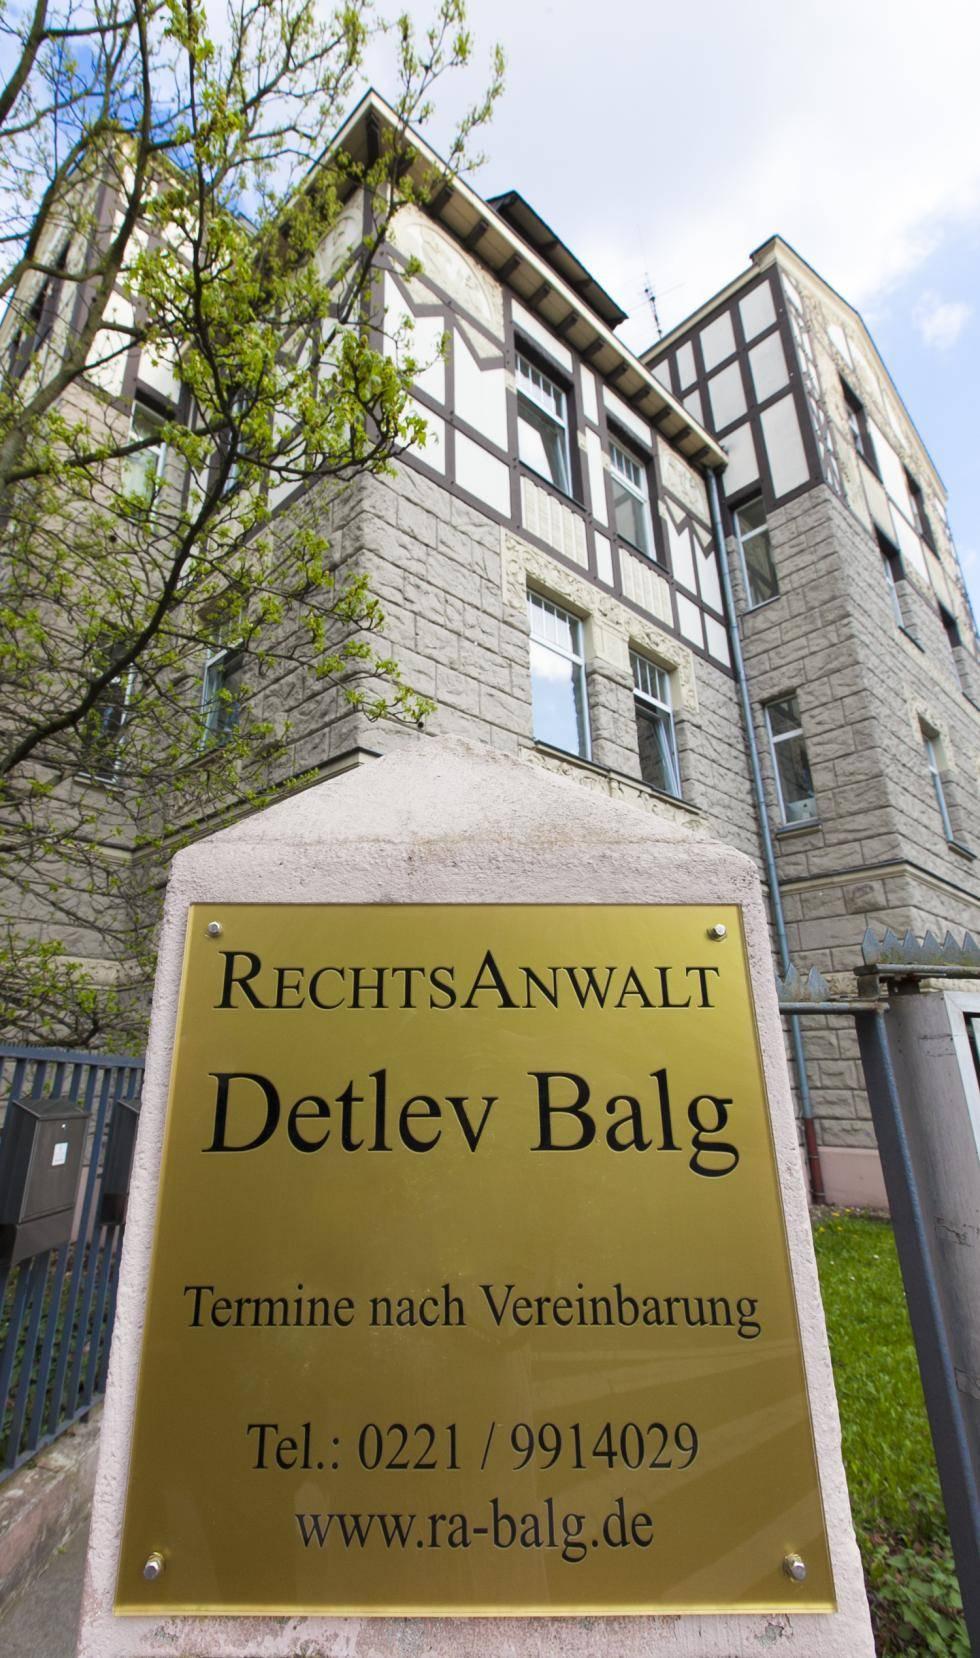 Rechtsanwaltskanzlei Detlev Balg